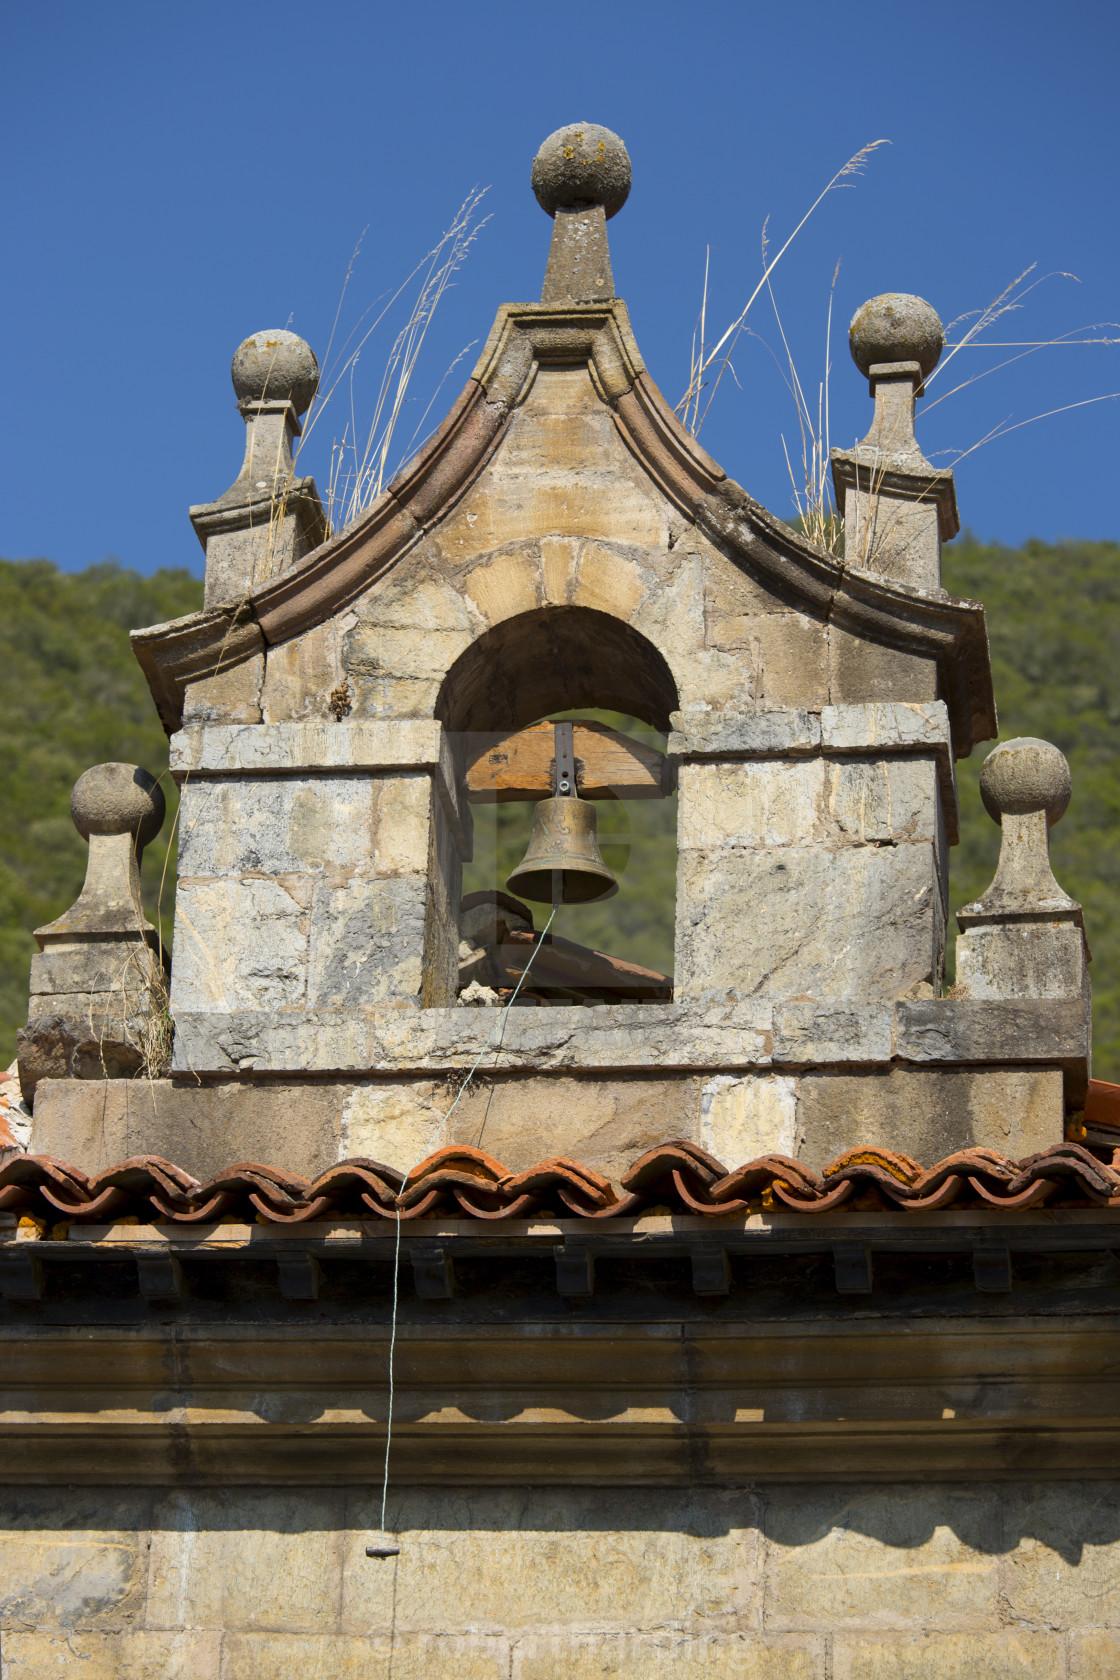 """Bell tower at Cabazon de Liebana within the Picos de Europa mountains in..."" stock image"